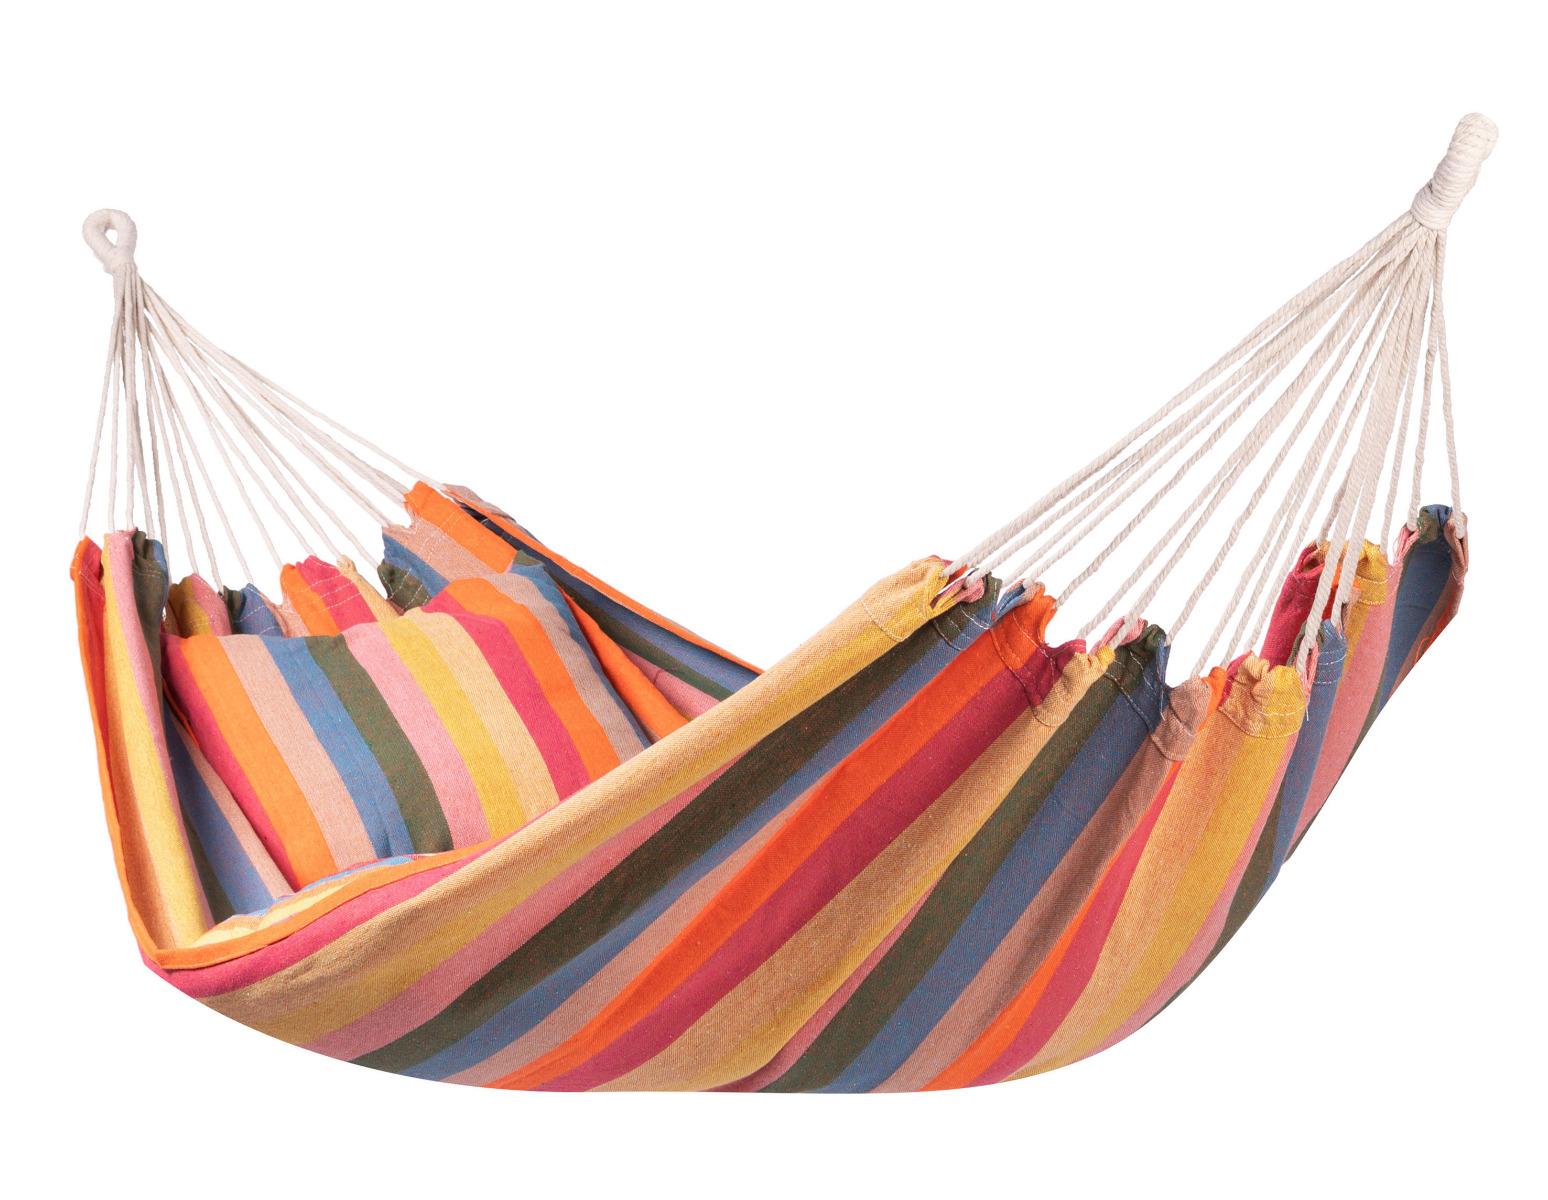 Hangmat E�npersoons 'Gomera' Single - Veelkleurig - 123 Hammock